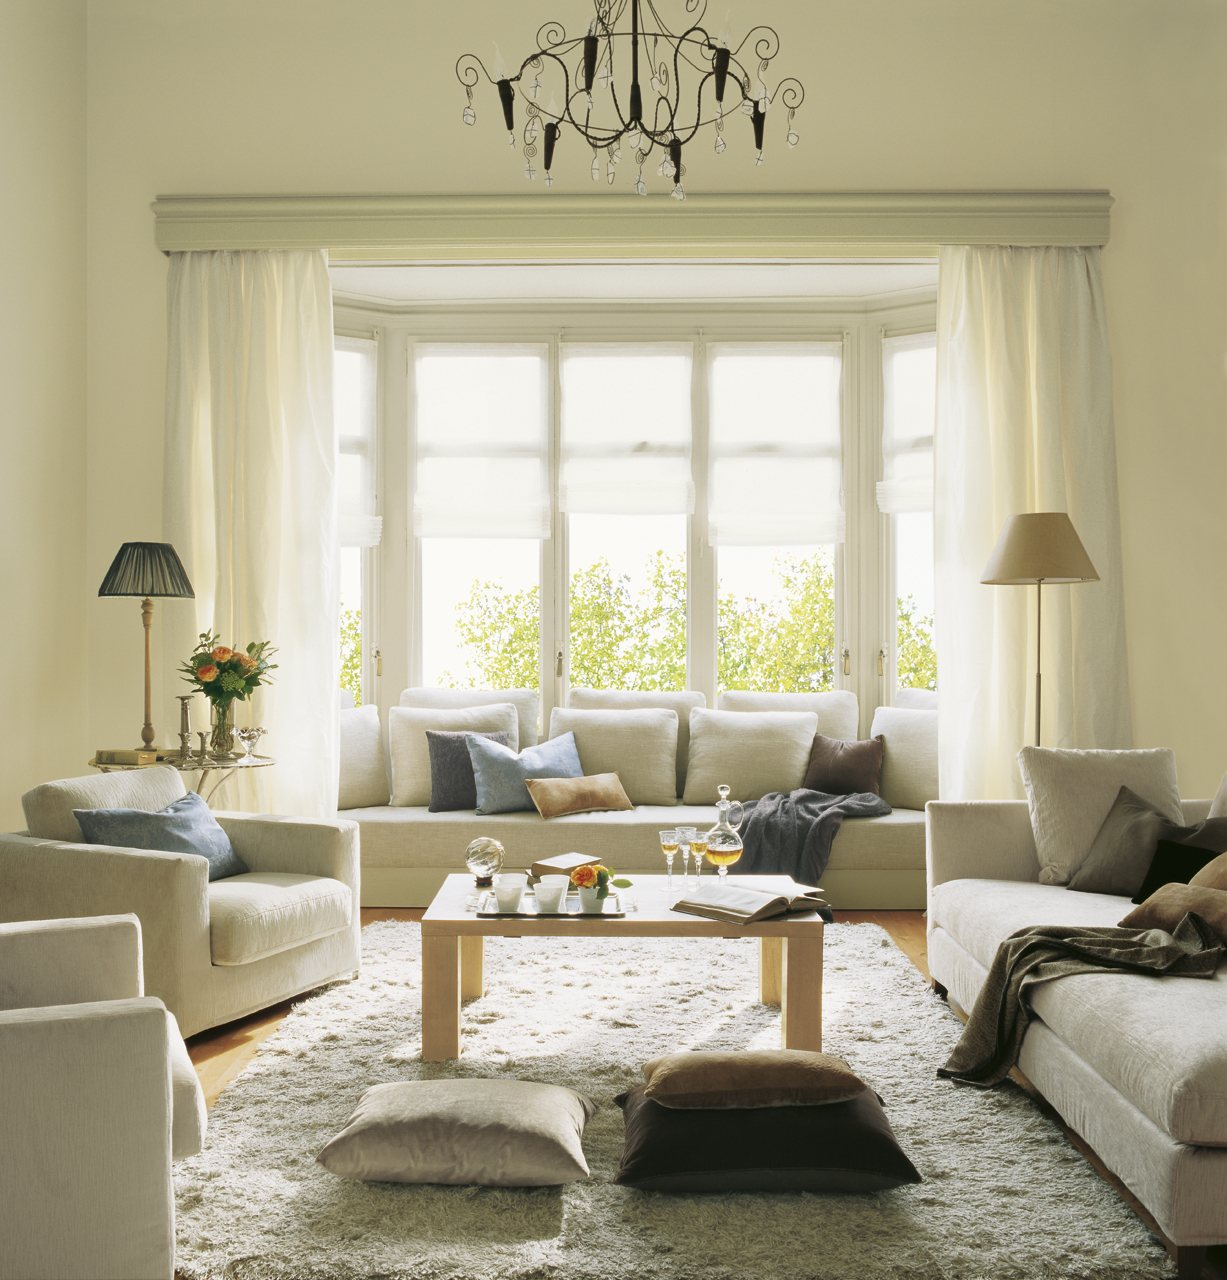 12 buenas ideas para renovar el sal n for Modernizar salon muebles clasicos